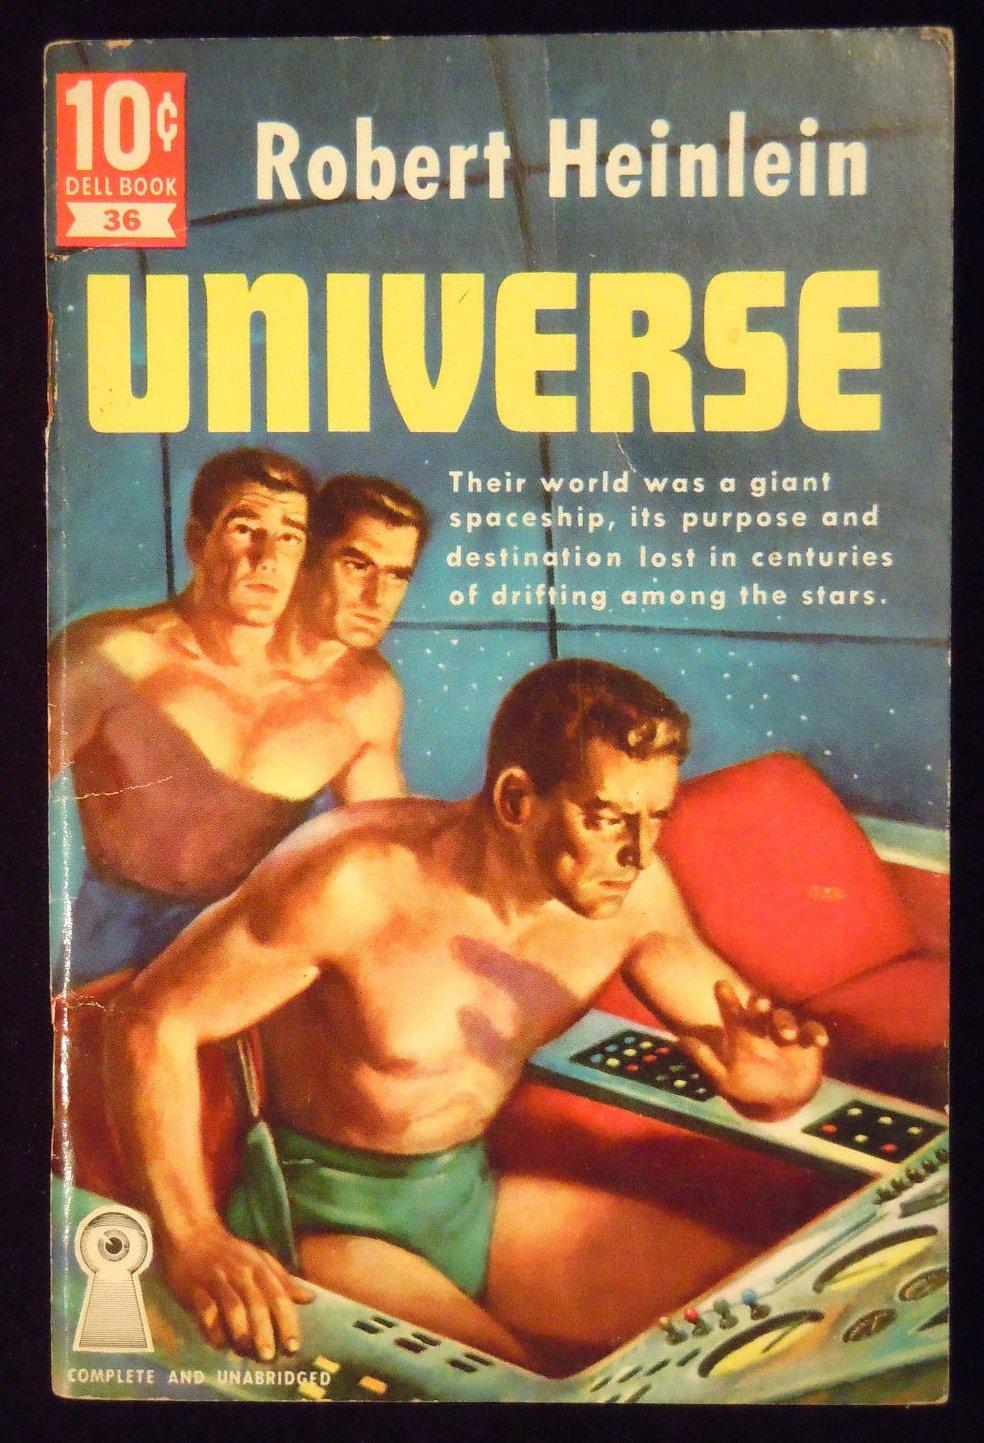 Zaphod Beeblebrox was my idea first - Roberta Heinlein